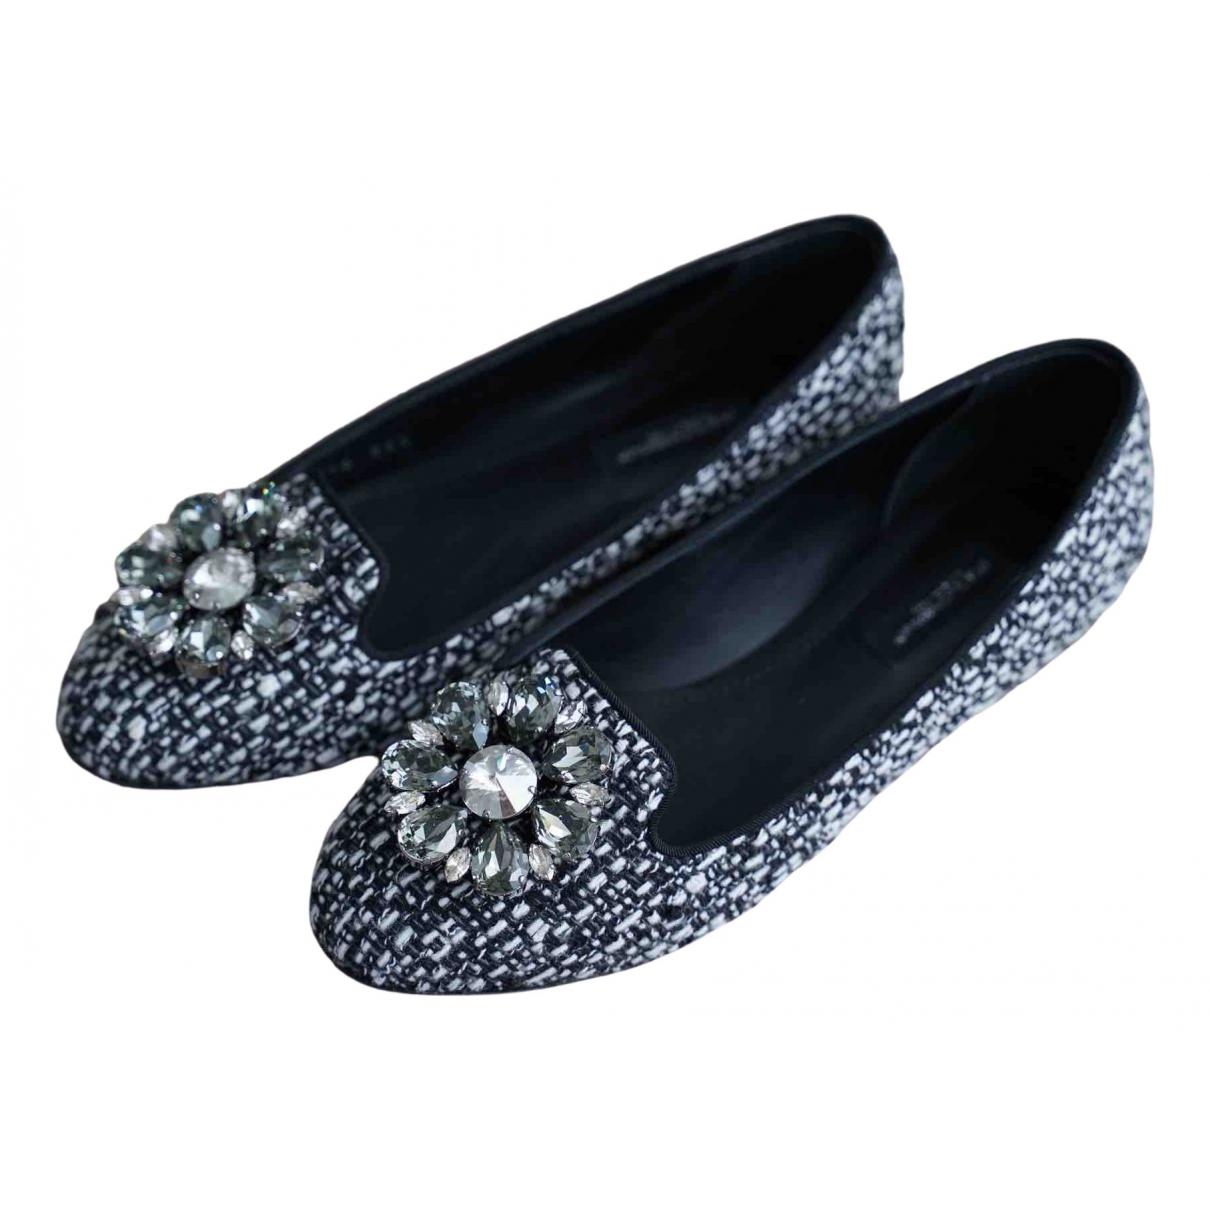 Bailarinas Tweed Dolce & Gabbana